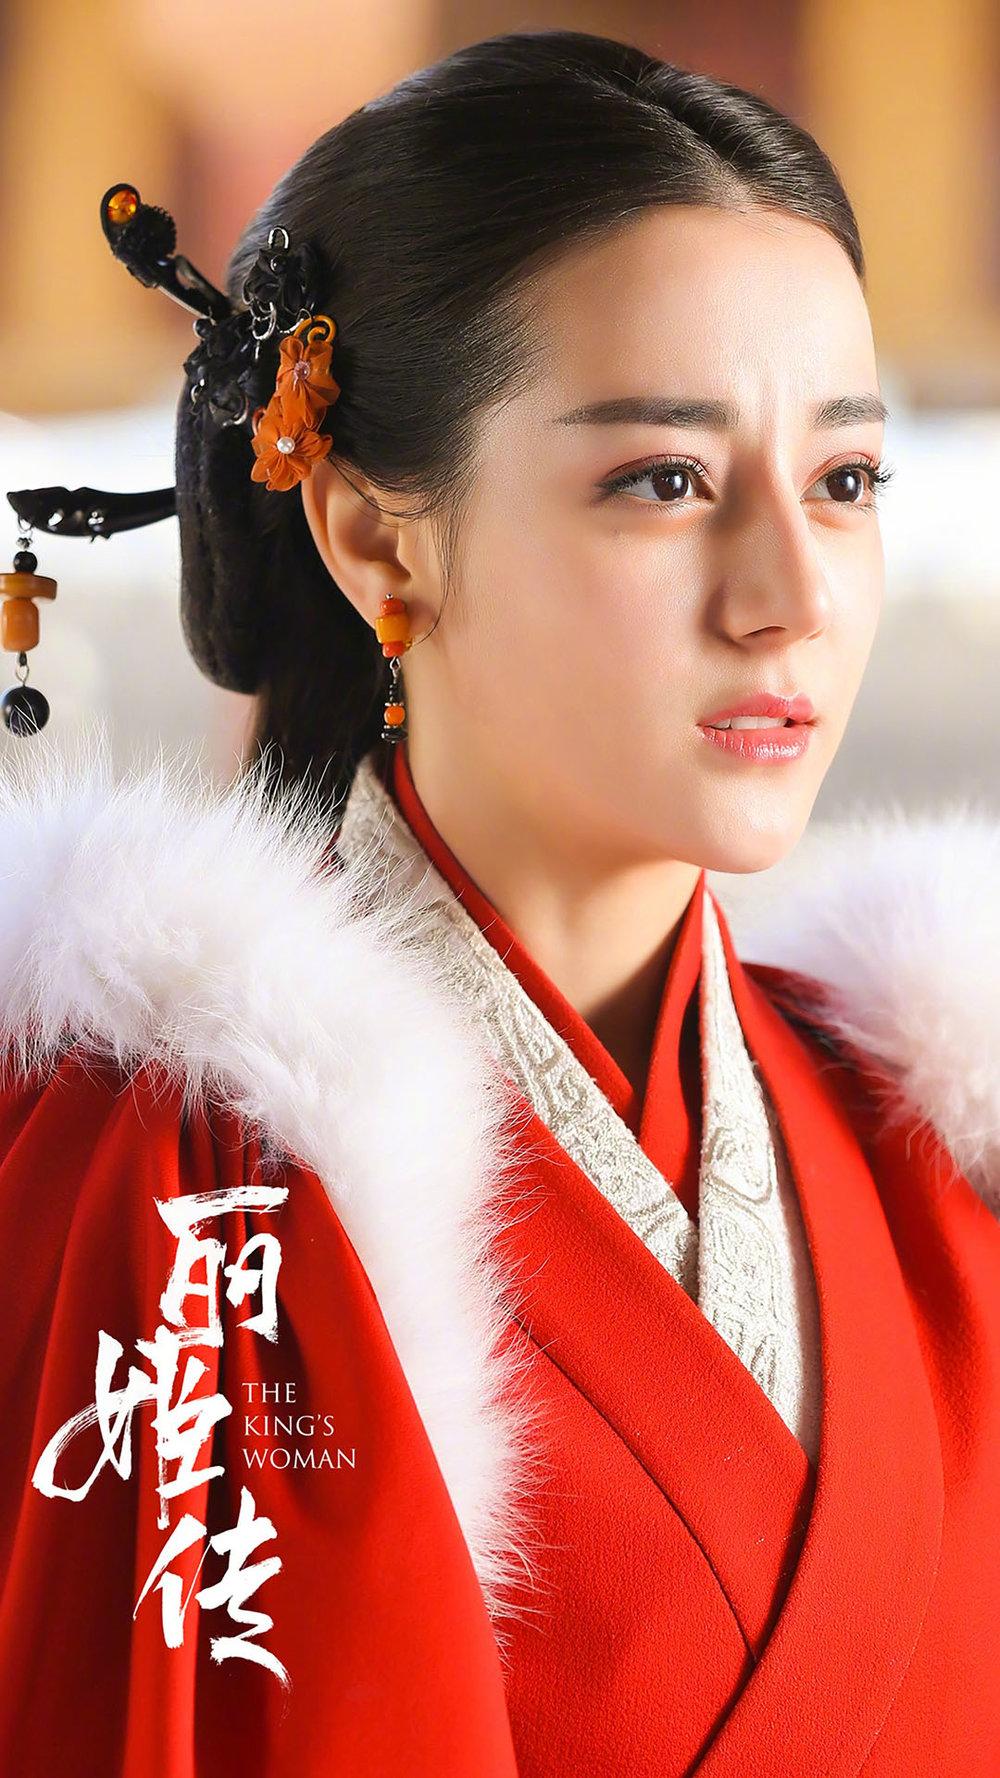 - THE KING'S WOMAN丽姬传/秦时丽人明月心Status: August 14Length: 50 EpisodesMain Cast: Zhang Binbin 张彬彬Dilraba Dilmurat 迪丽热巴